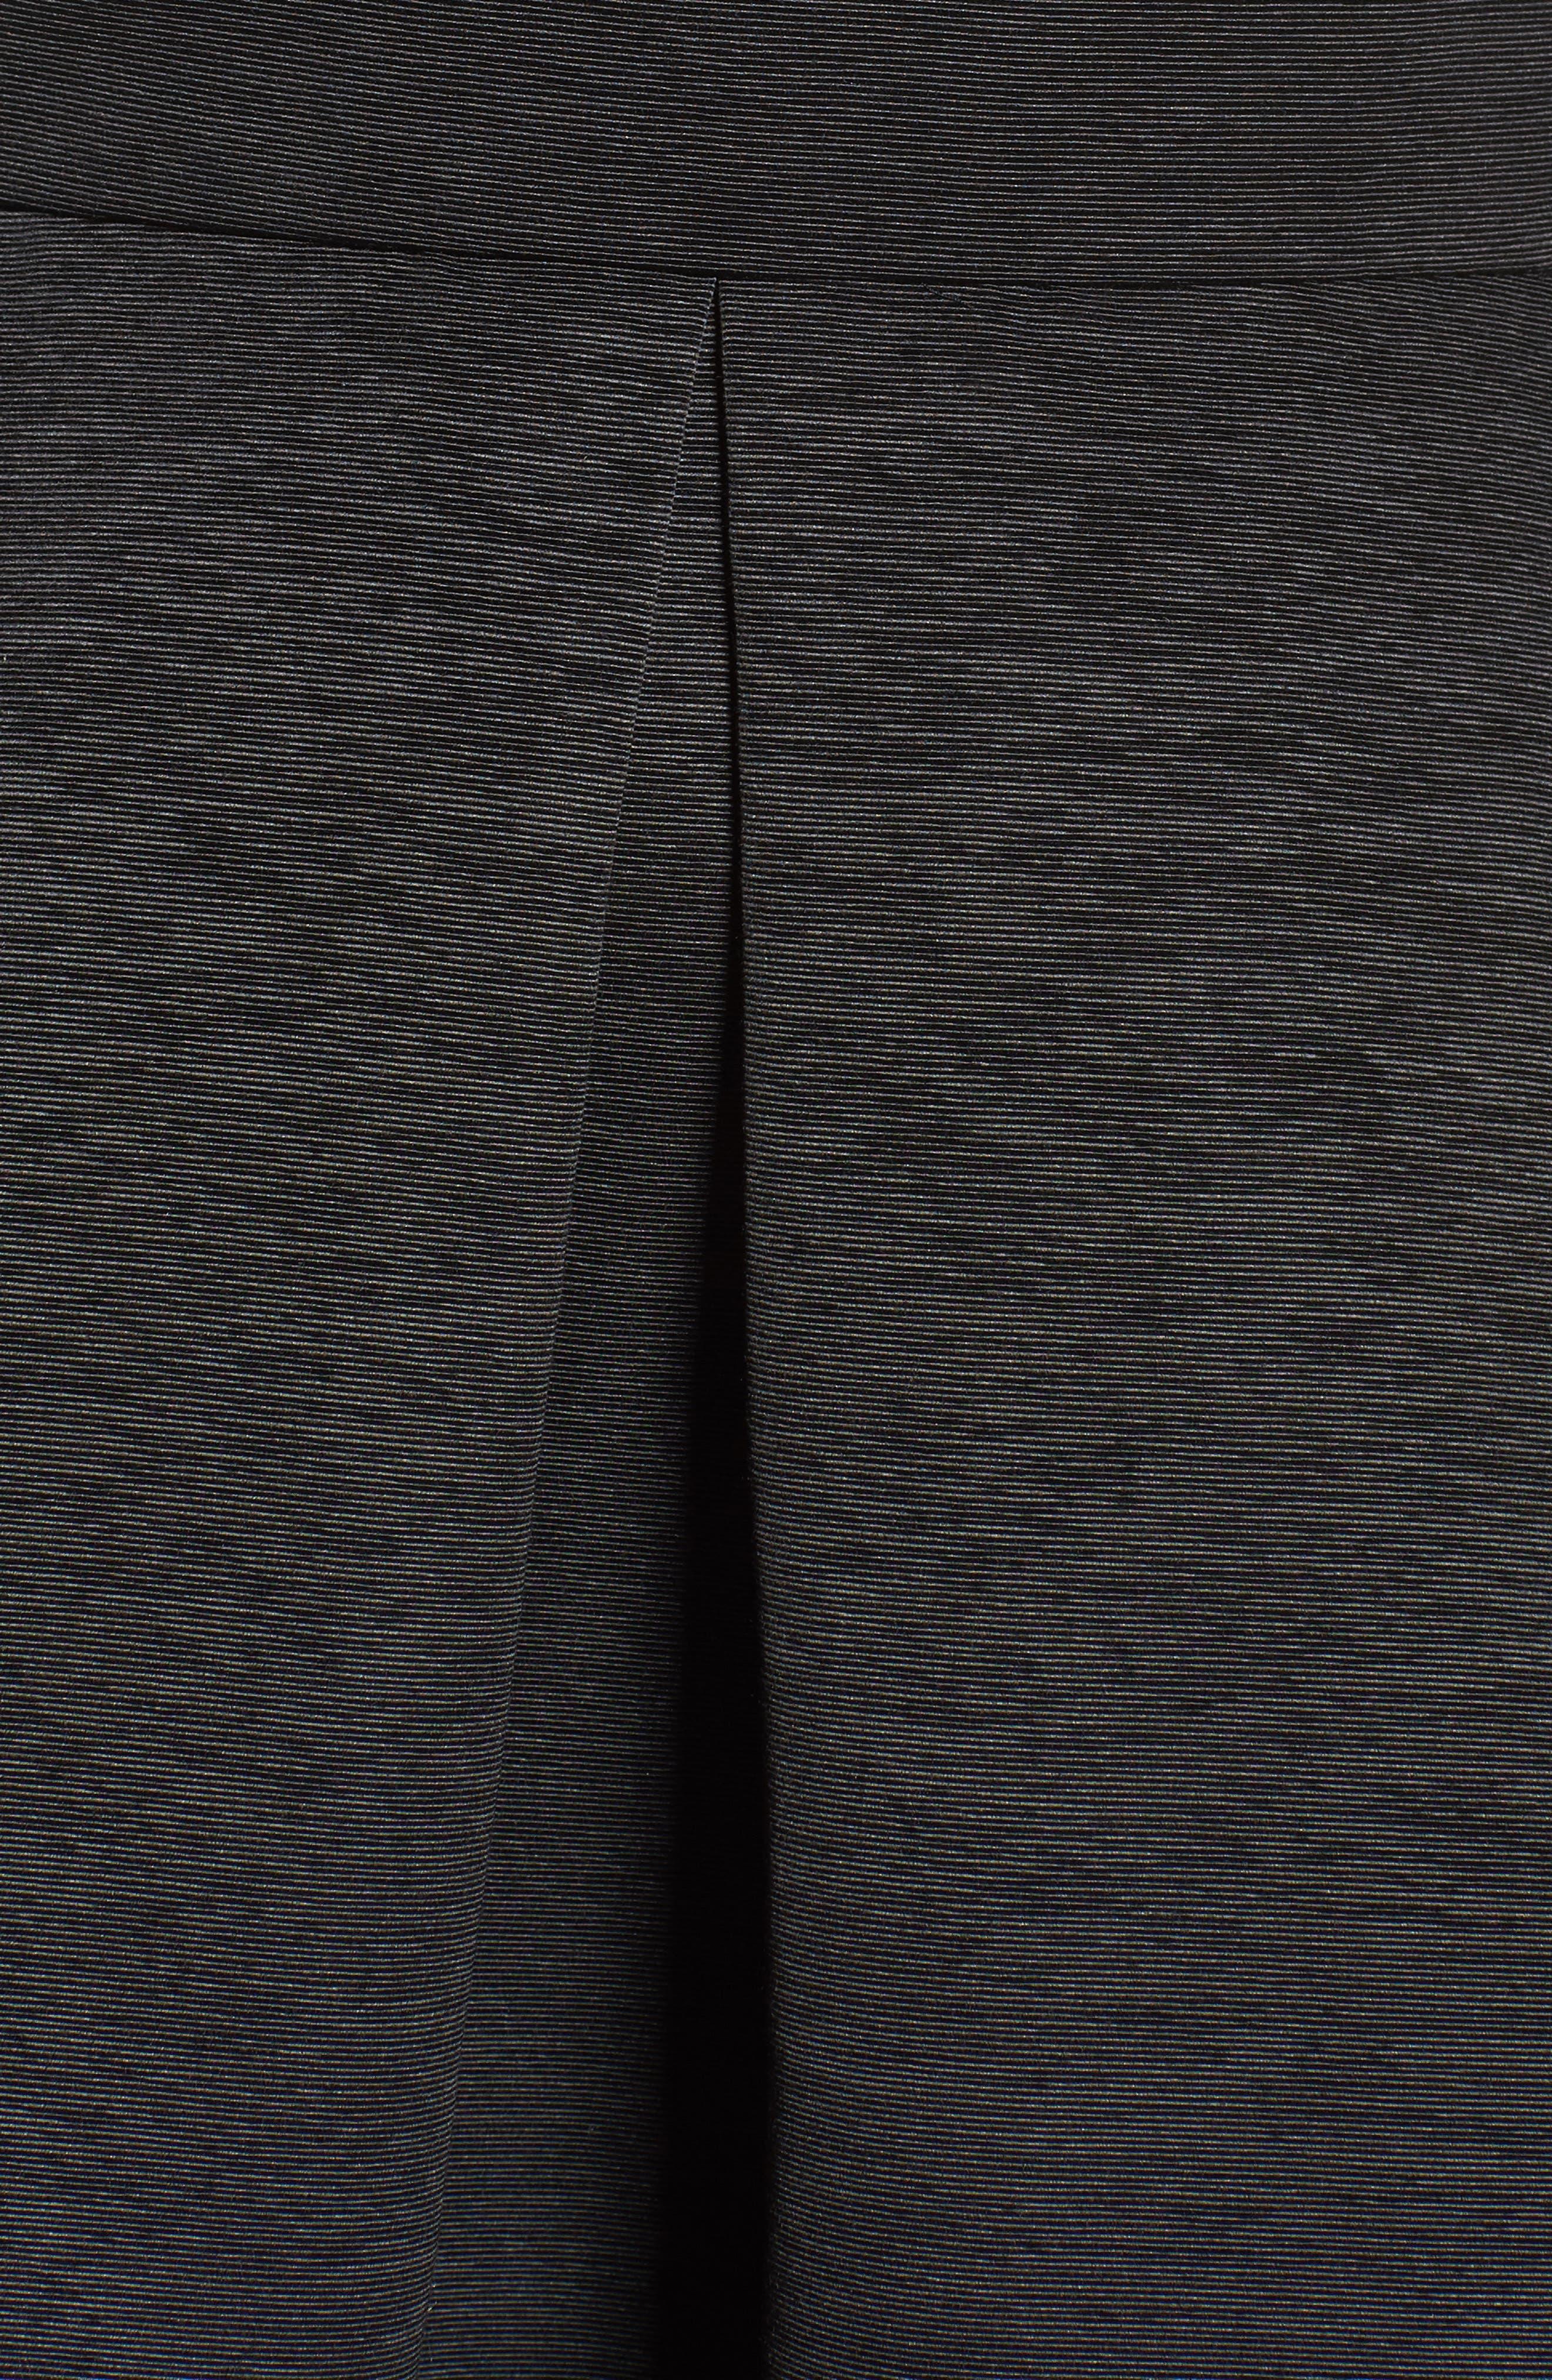 Off the Shoulder A-Line Dress,                             Alternate thumbnail 7, color,                             BLACK